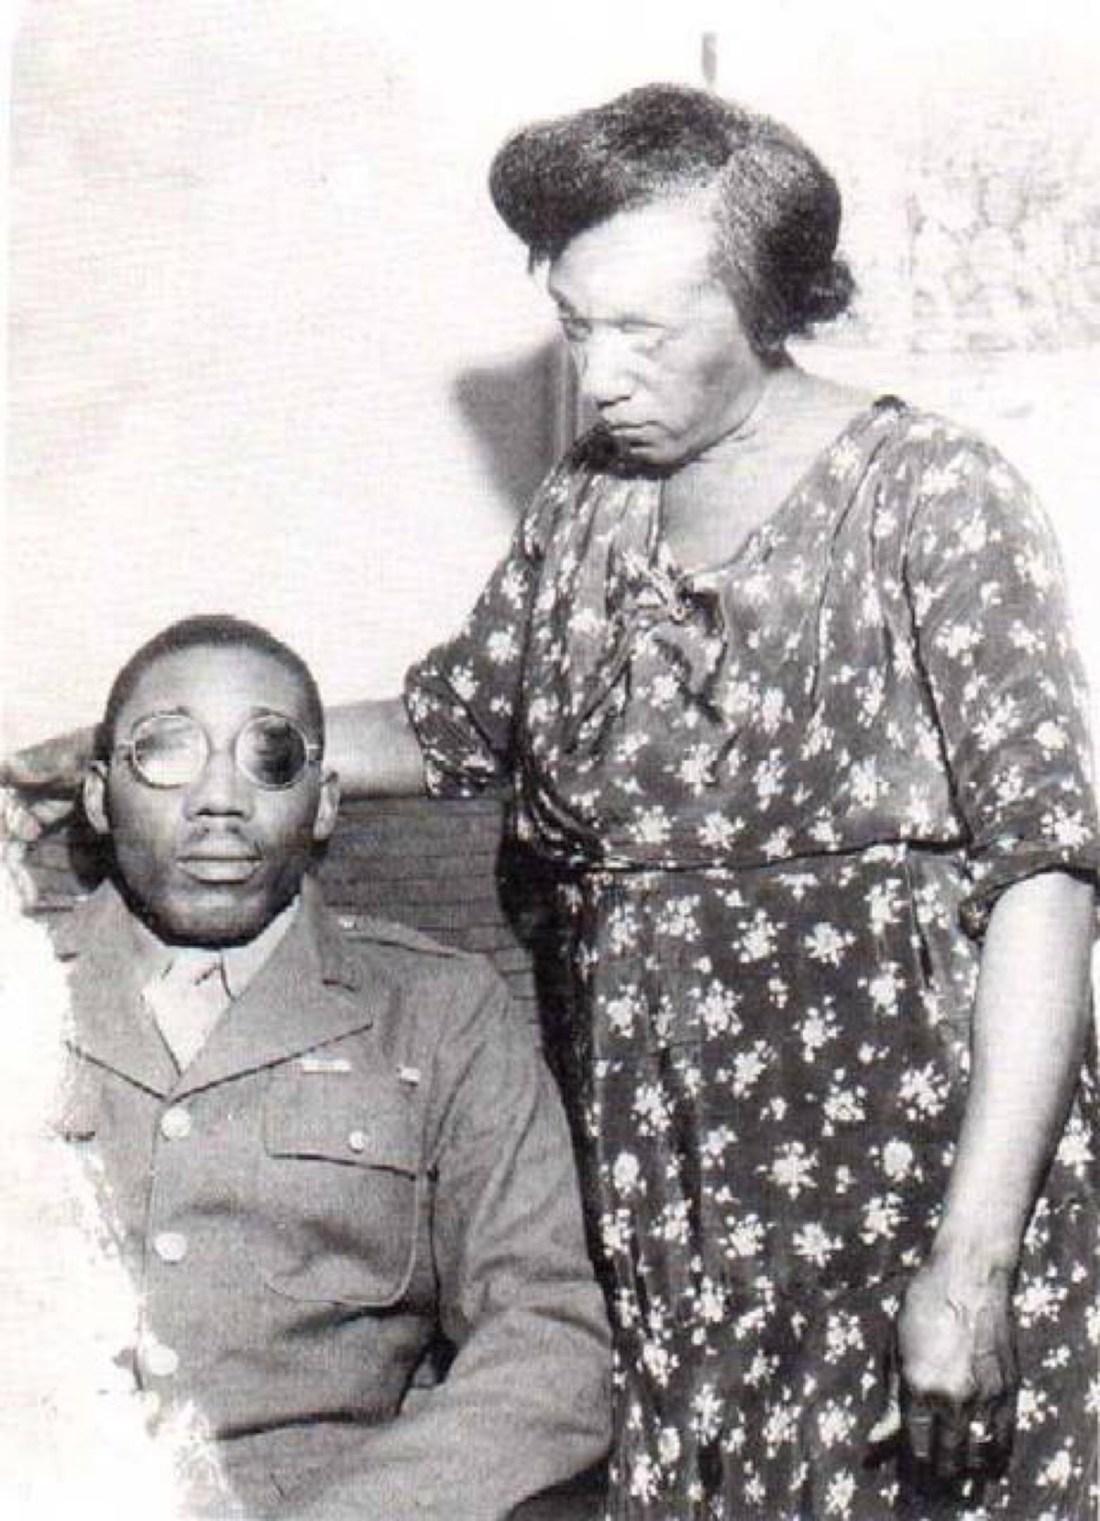 Isaac Woodard, African American Veteran, African American Soldier, African American History, Black History, Black Veteran, Civil Rights, KOLUMN Magazine, KOLUMN